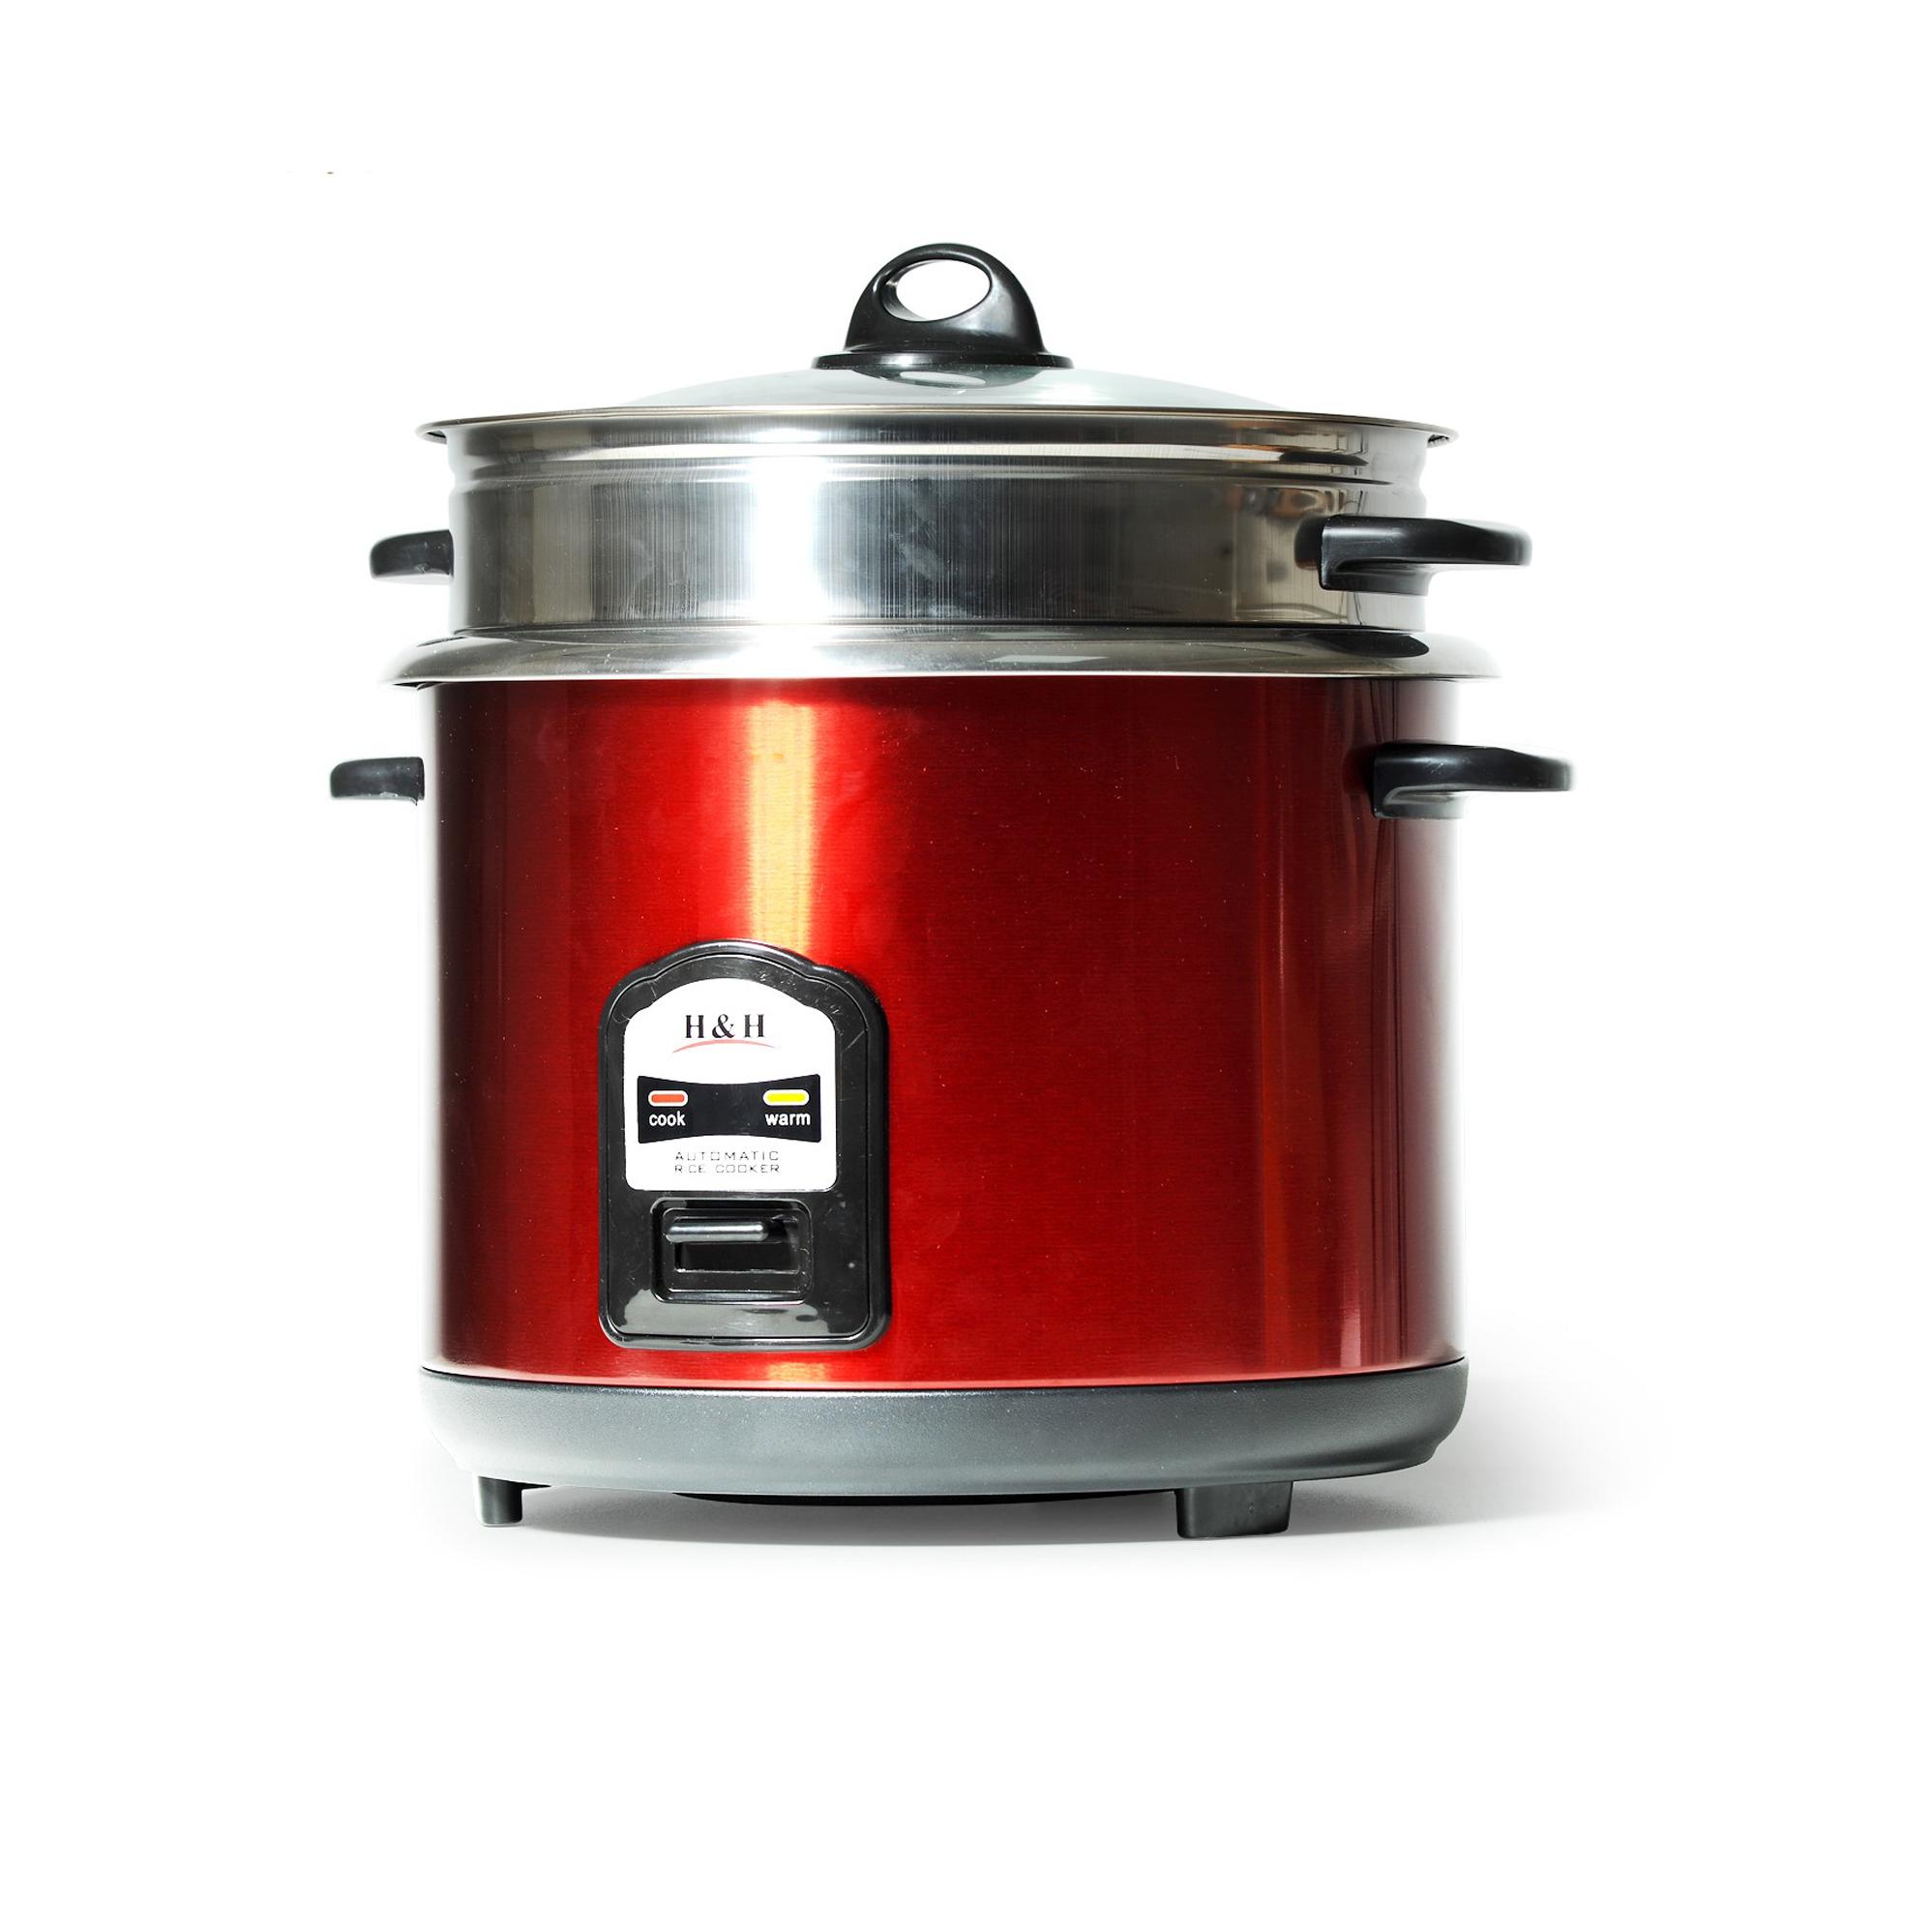 Hamko H&h Rice Cooker 1000w 2.8l